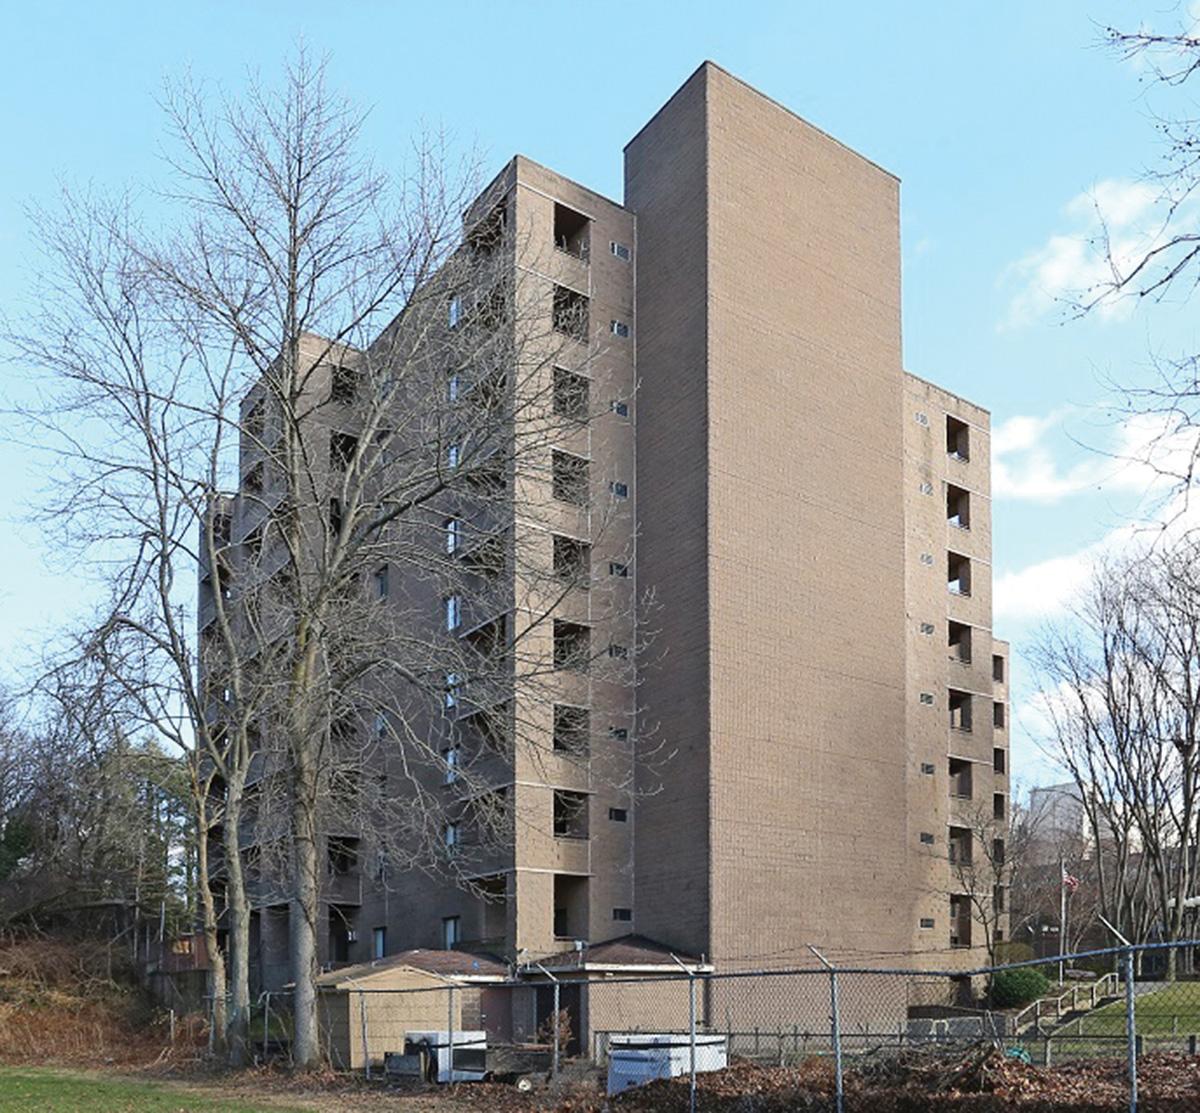 United multi family brokers 7 6 million sale of 72 unit for Park ridge building department